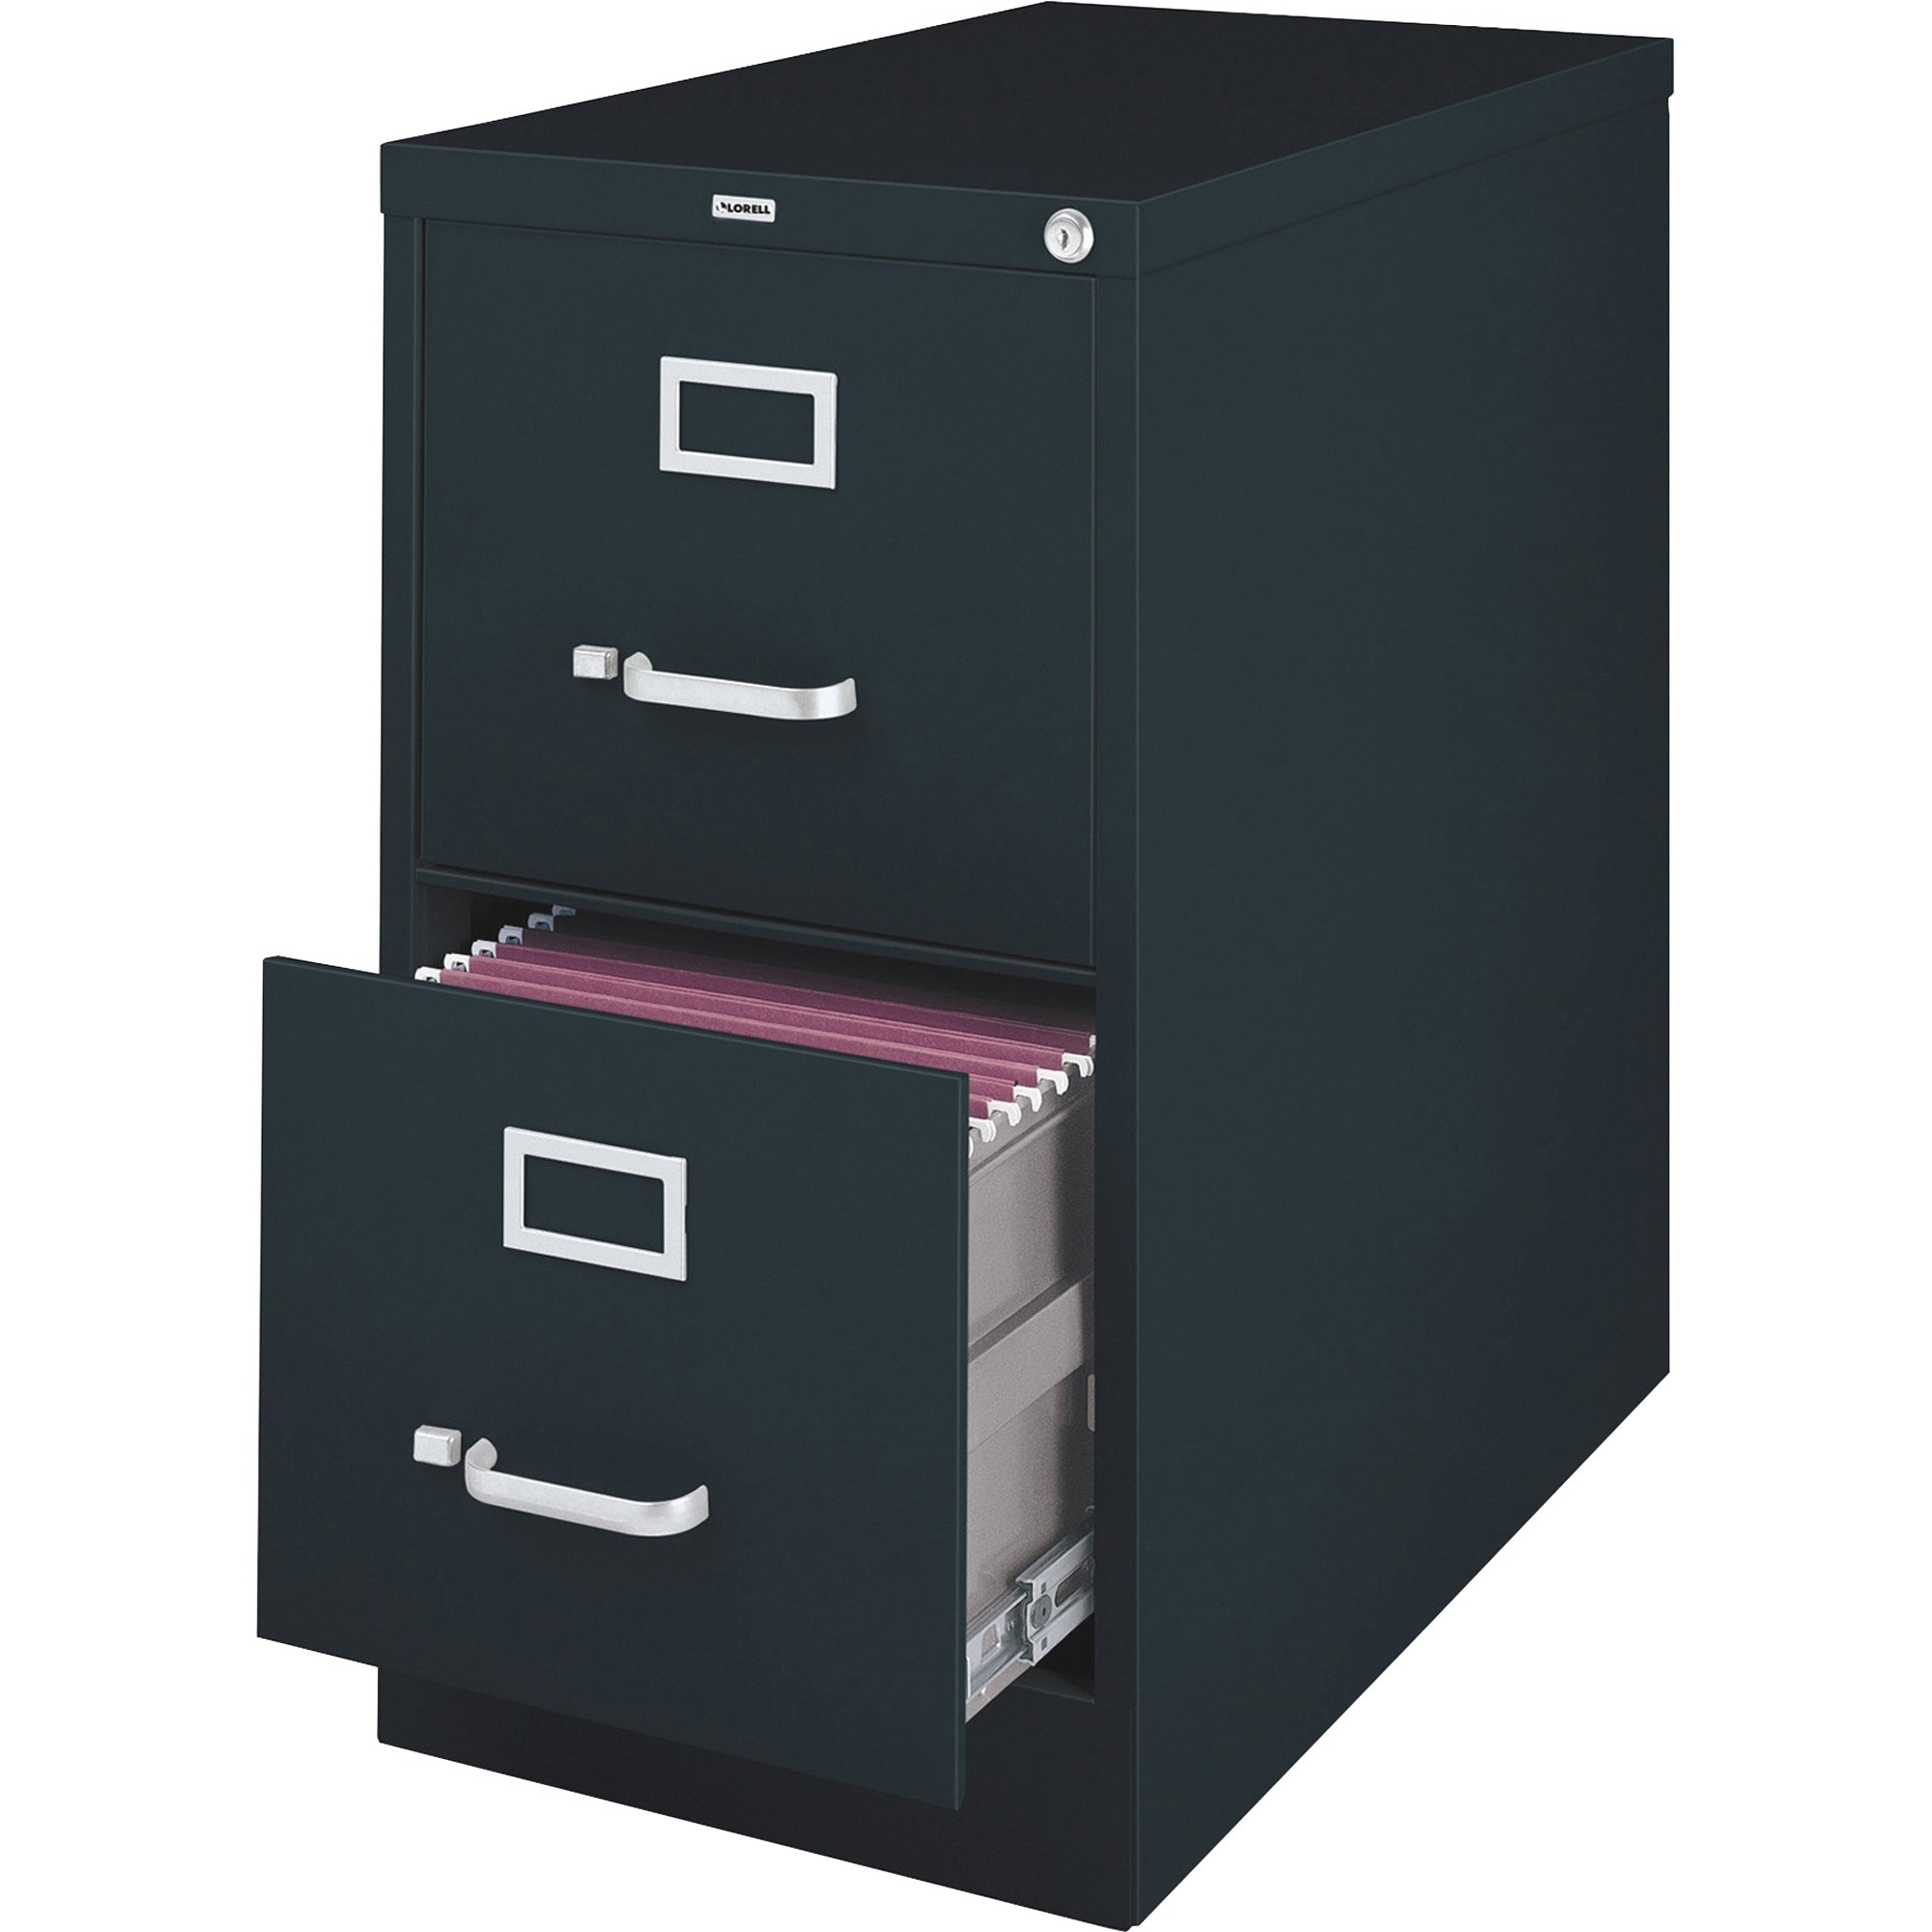 Lorell, LLR60661, Vertical File Cabinet, 1 Each, Black